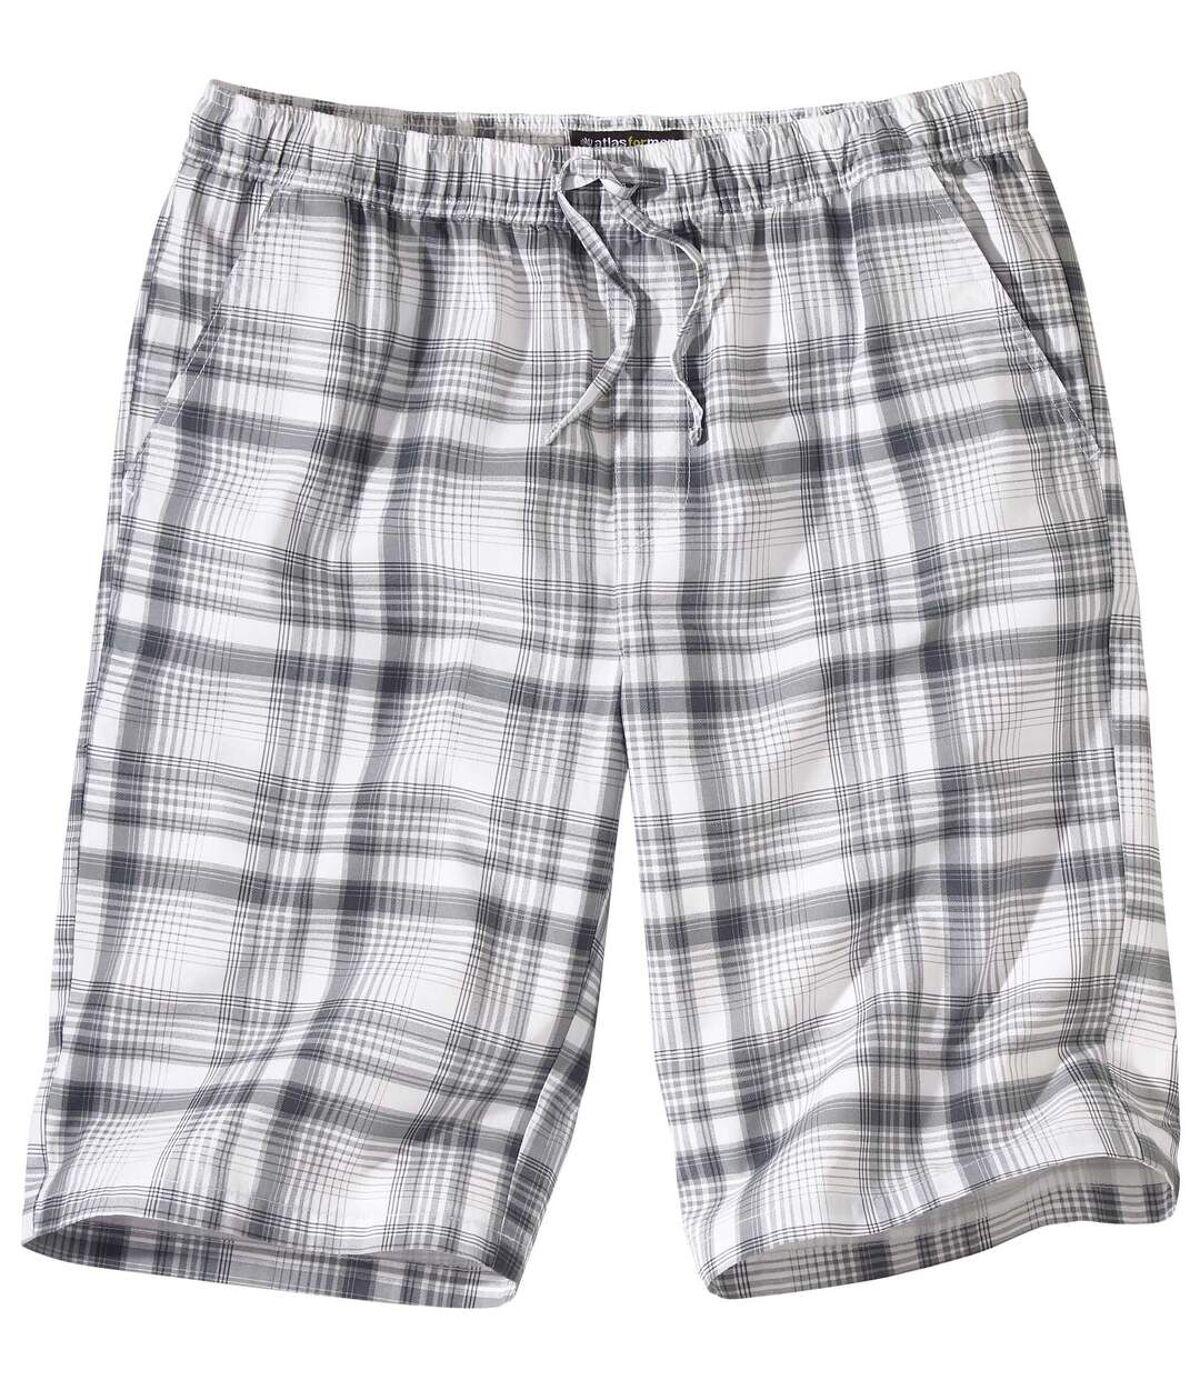 Men's Grey Checked Shorts Atlas For Men